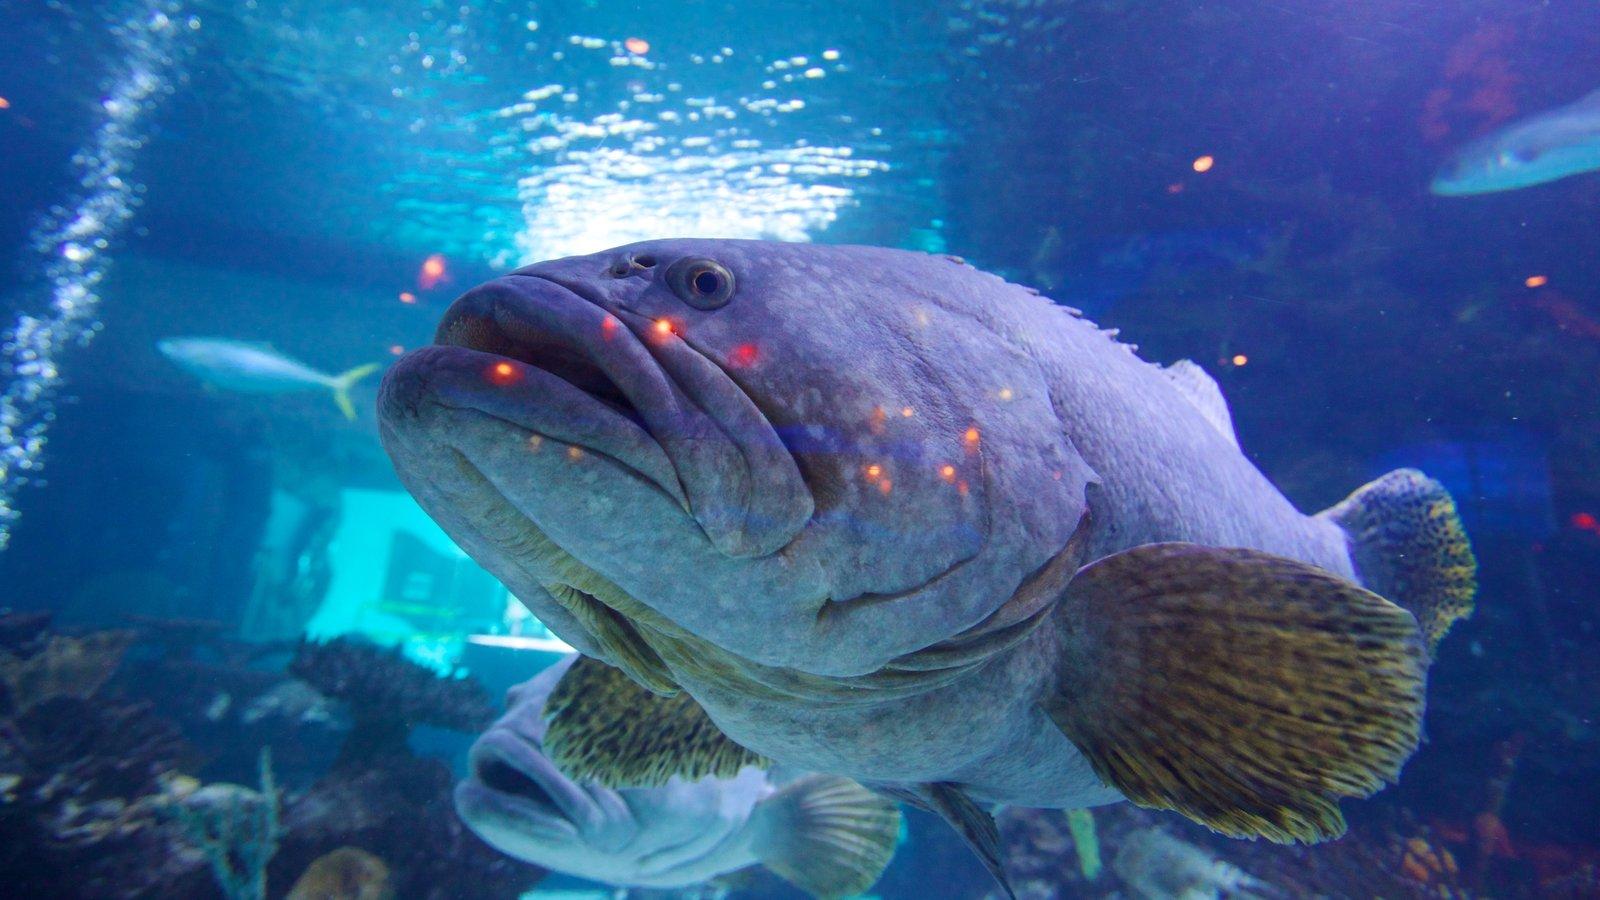 Downtown Aquarium Pictures View Photos Images Of